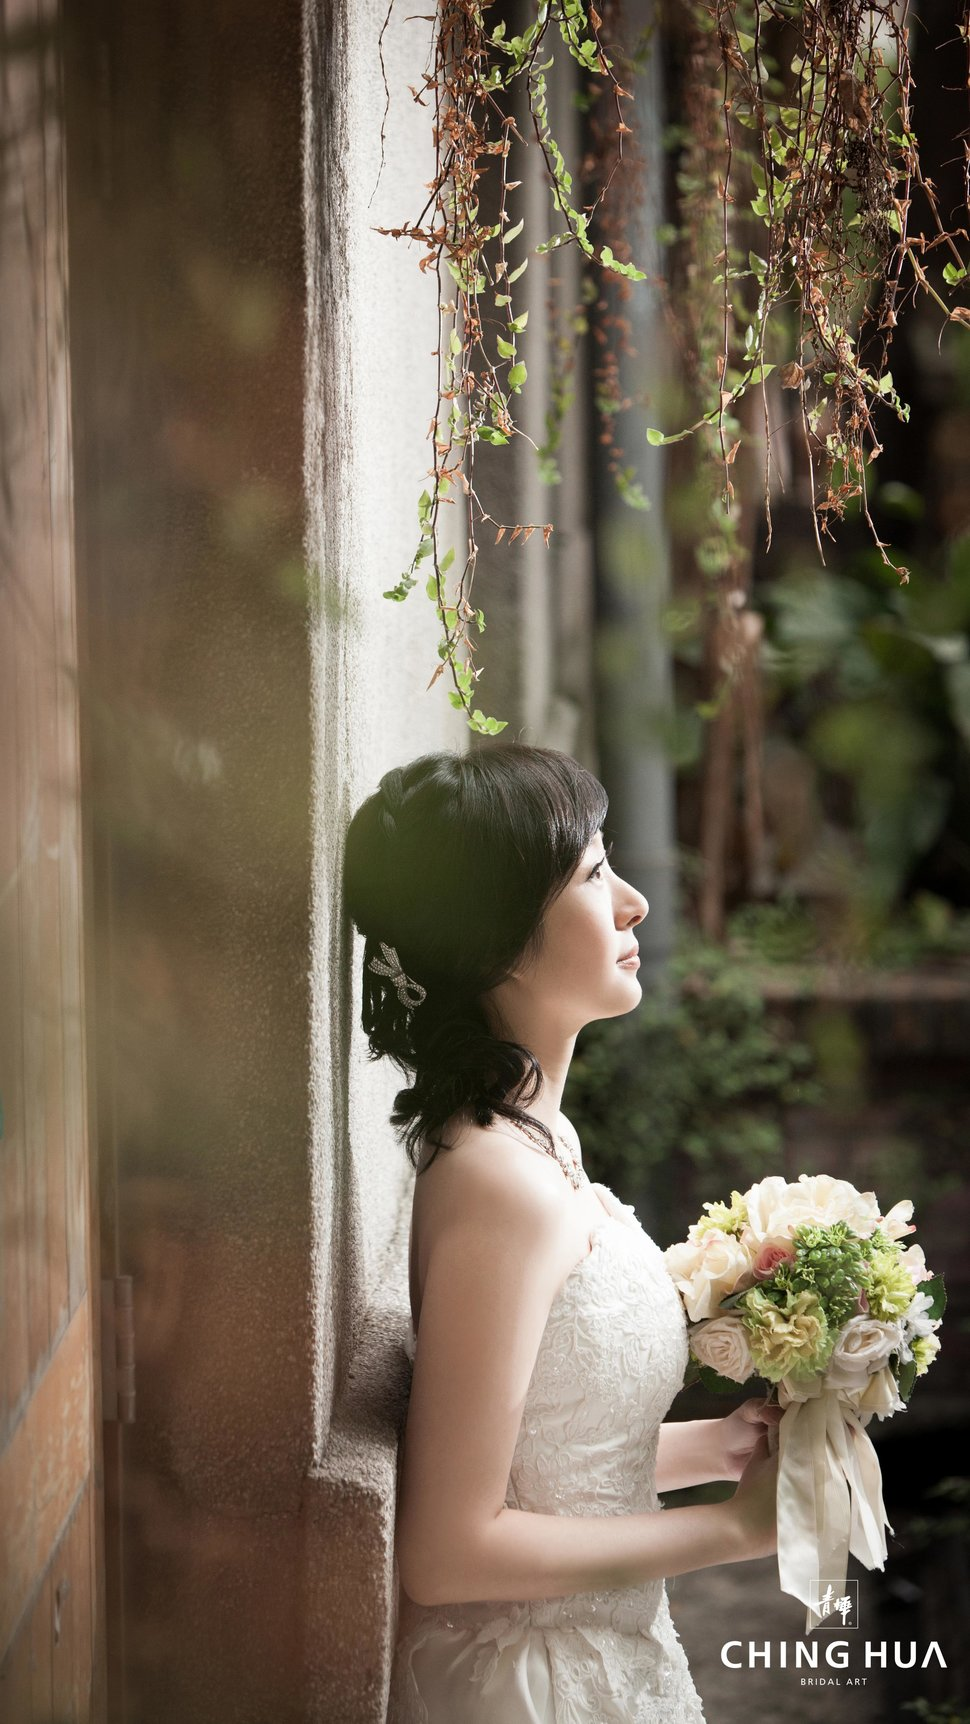 (編號:193281) - 青樺婚紗CHINGHUA - 結婚吧